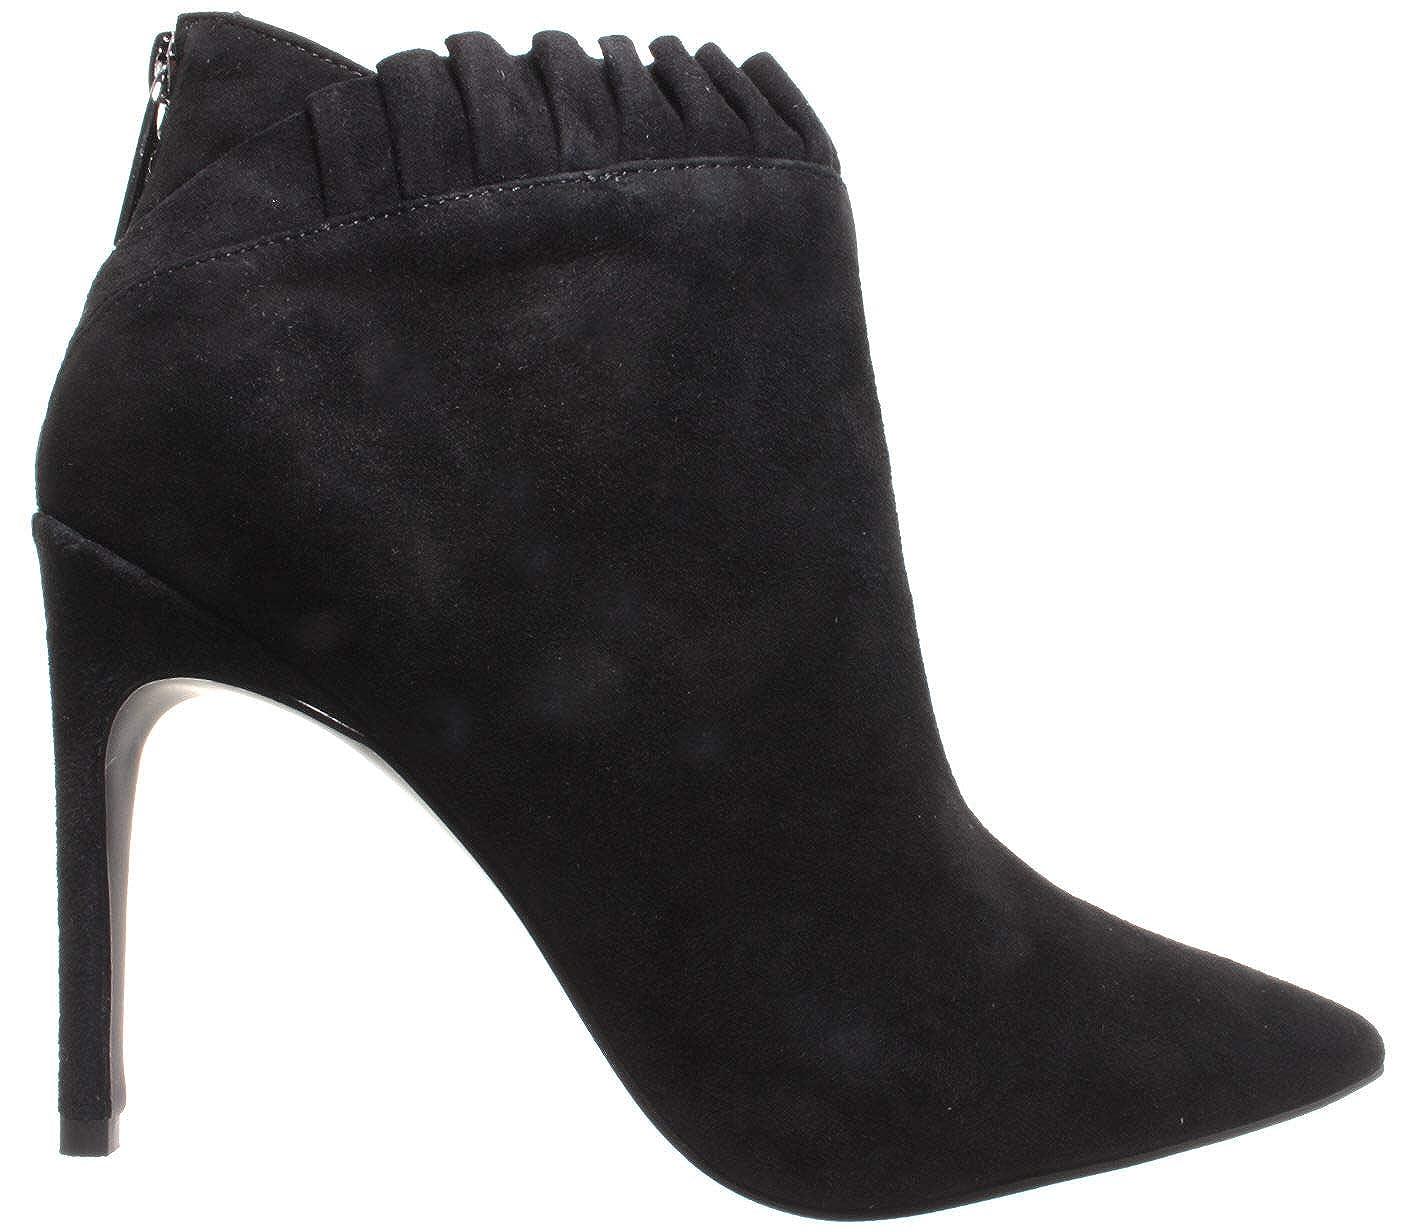 15b1dfed996 Liu Jo Women s Ankle Boot Shoes Heels Lola 05 Booty Kid Suede Black New   Amazon.co.uk  Shoes   Bags